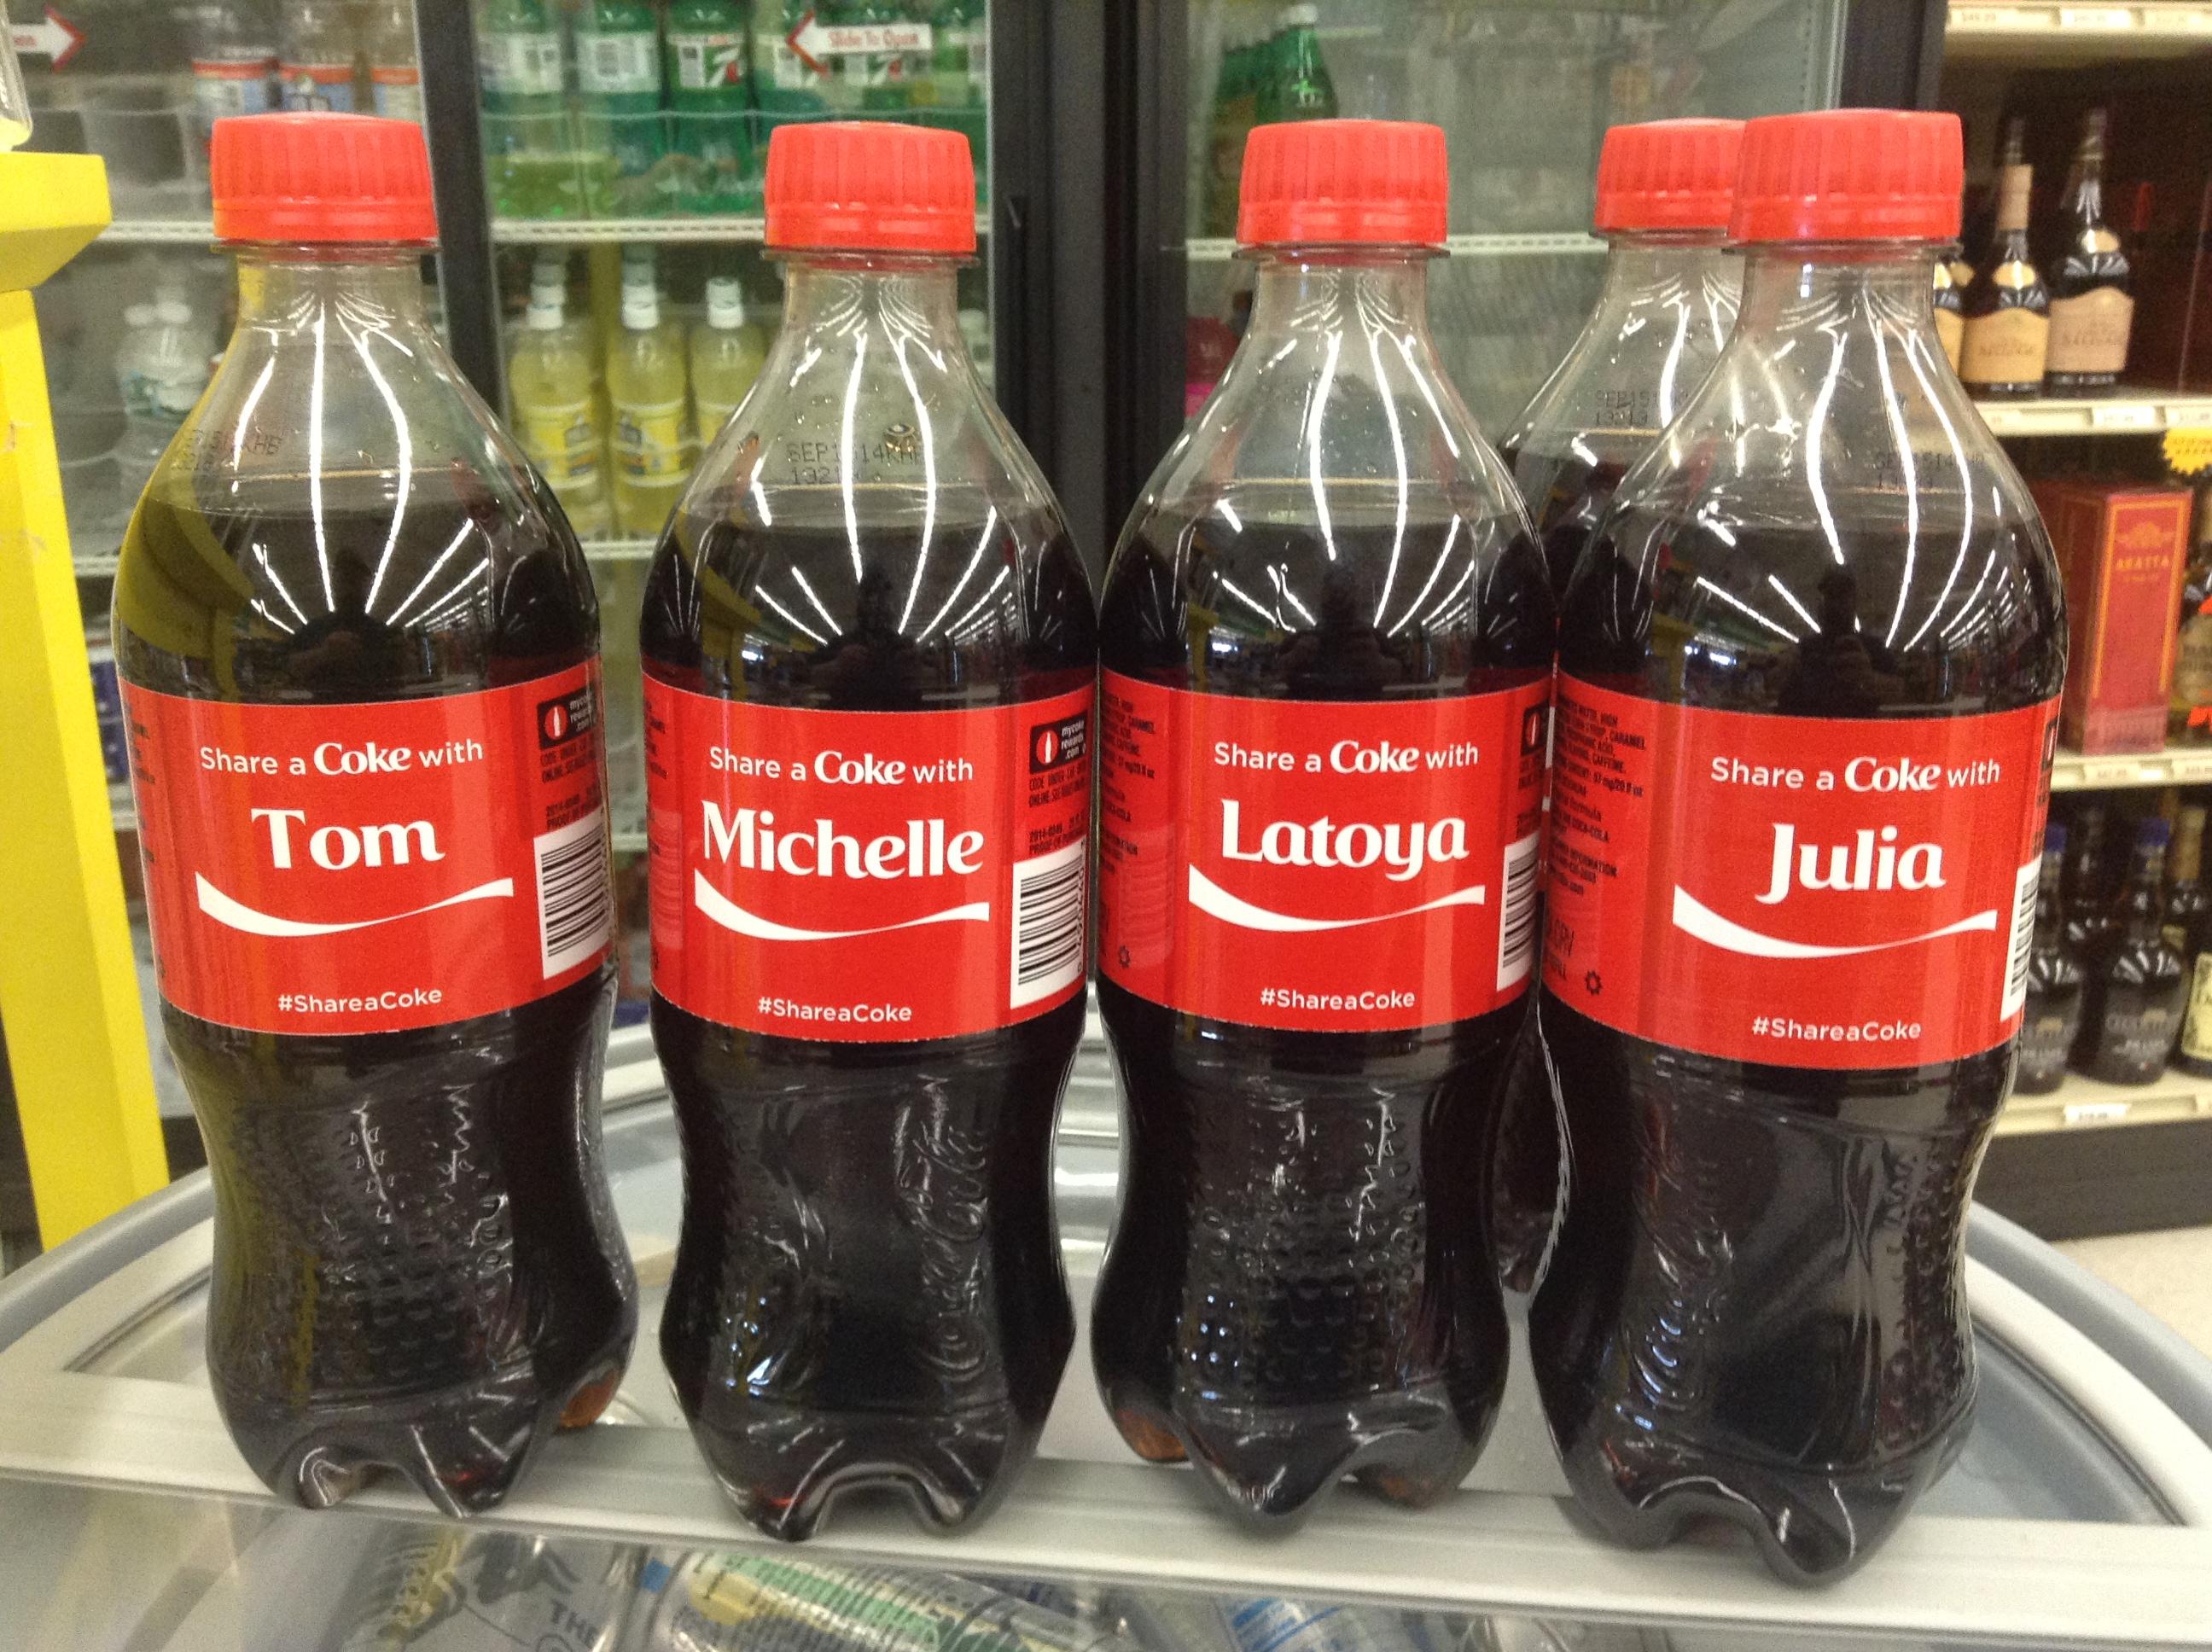 Evolution of Coke bottles and cans - INSIDER